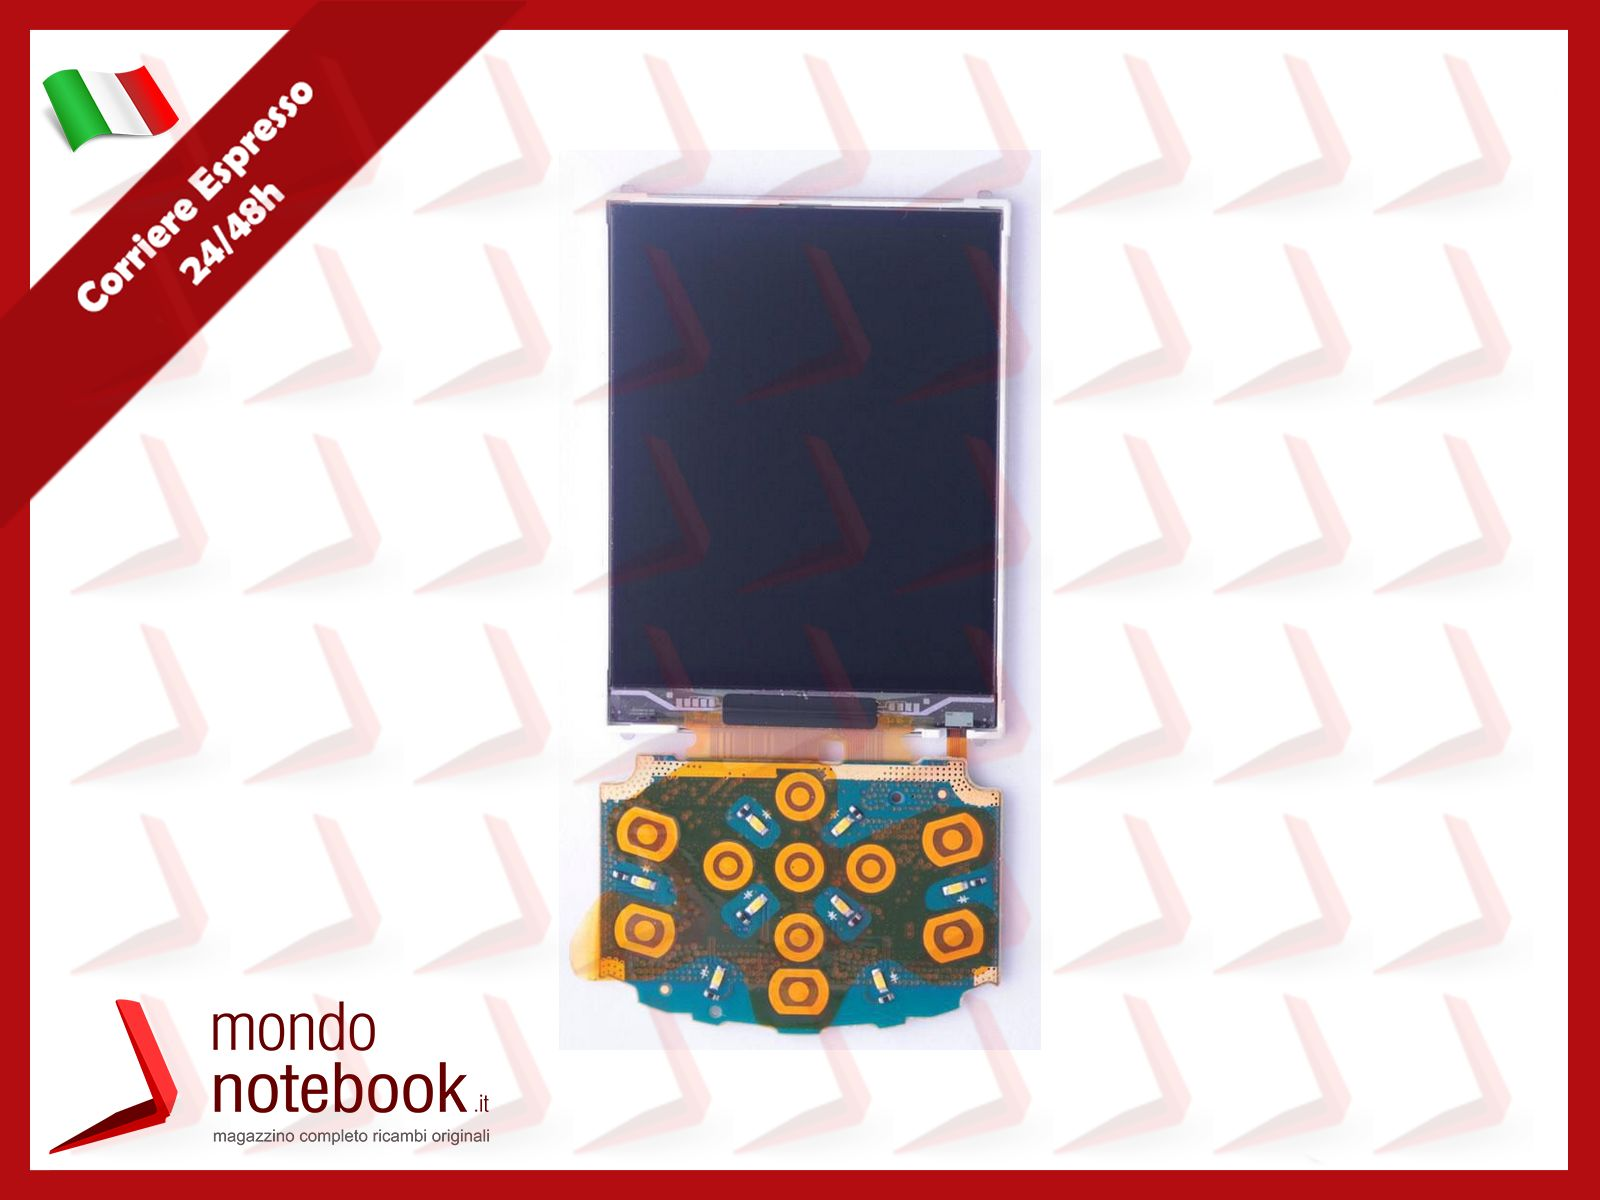 https://www.mondonotebook.it/11035/ventola-fan-cpu-toshiba-c650-c655-c655d-l650-l650d-l655-4-pinversione-1.jpg